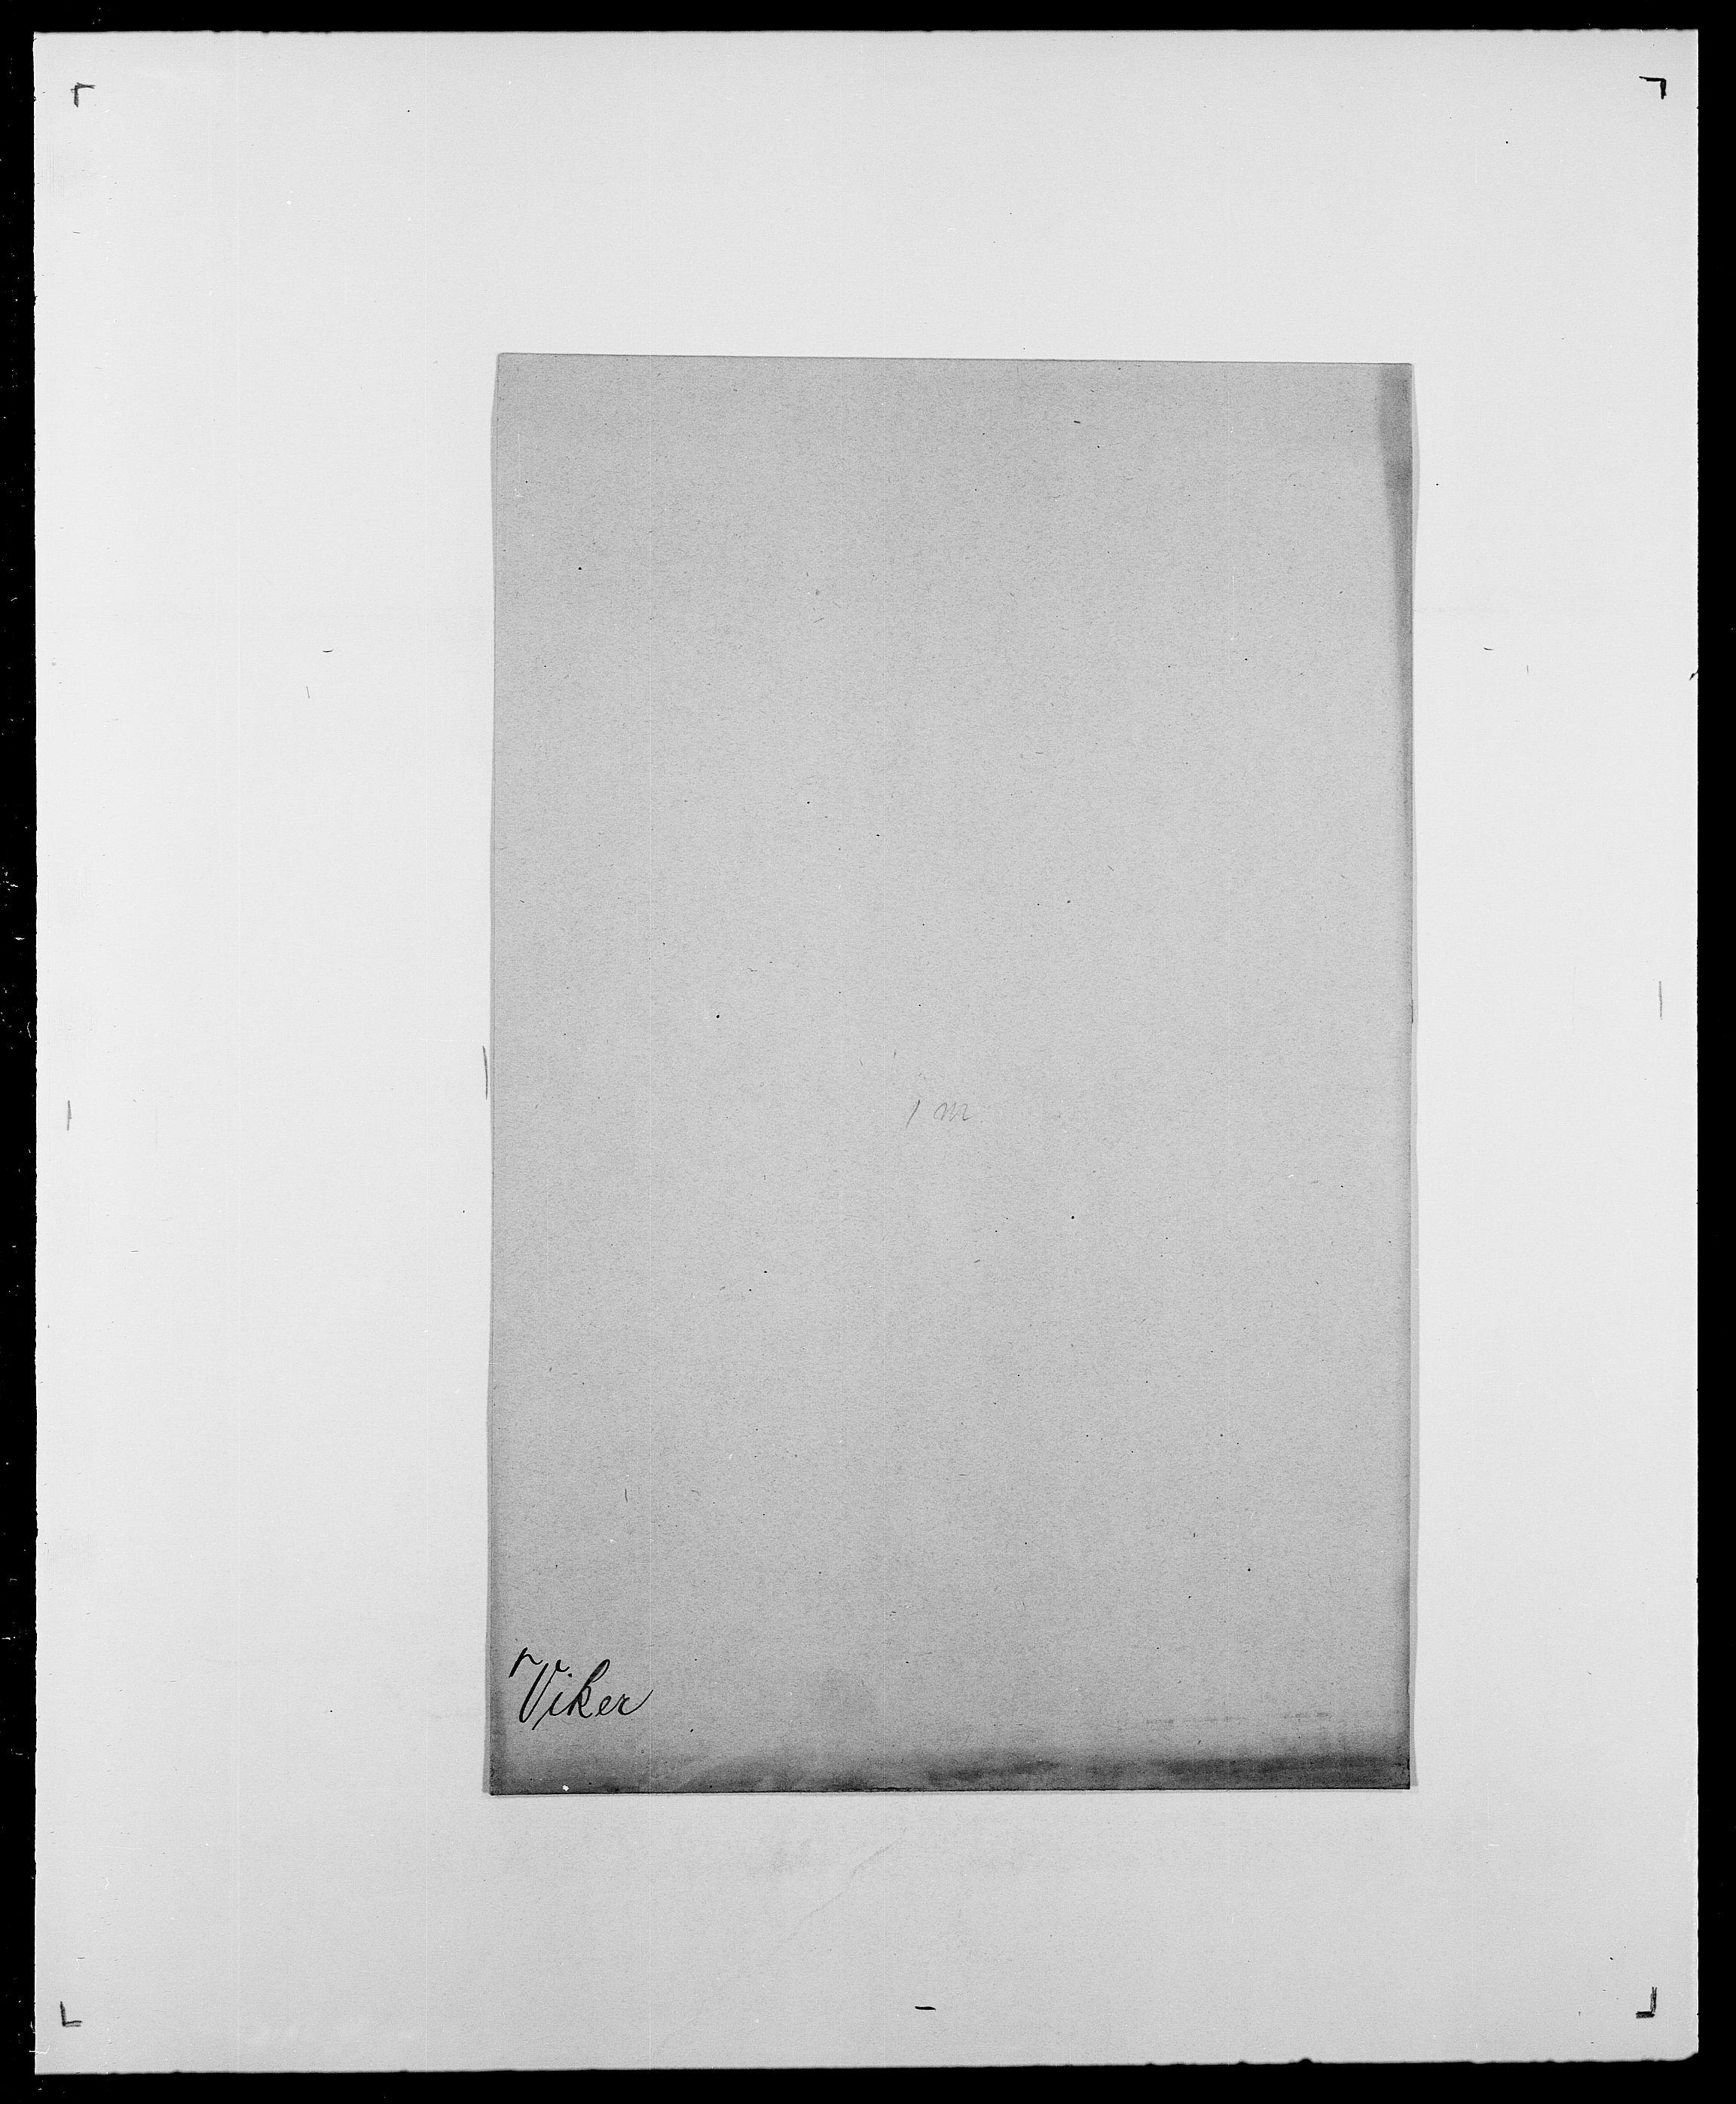 SAO, Delgobe, Charles Antoine - samling, D/Da/L0041: Vemmestad - Viker, s. 739